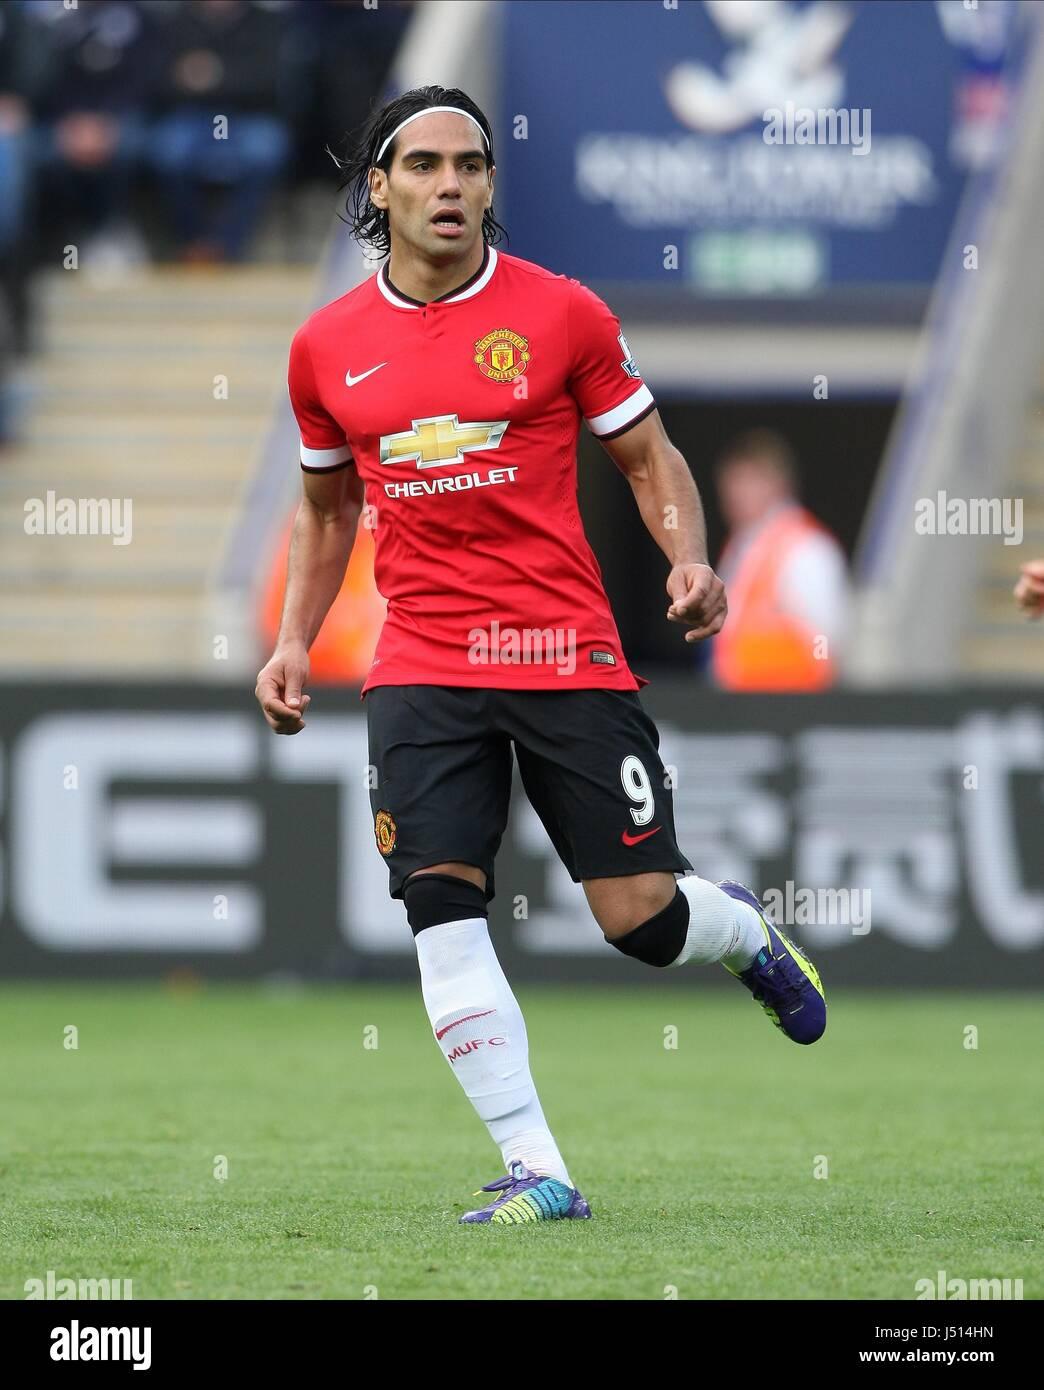 Falcao Man Utd 2014